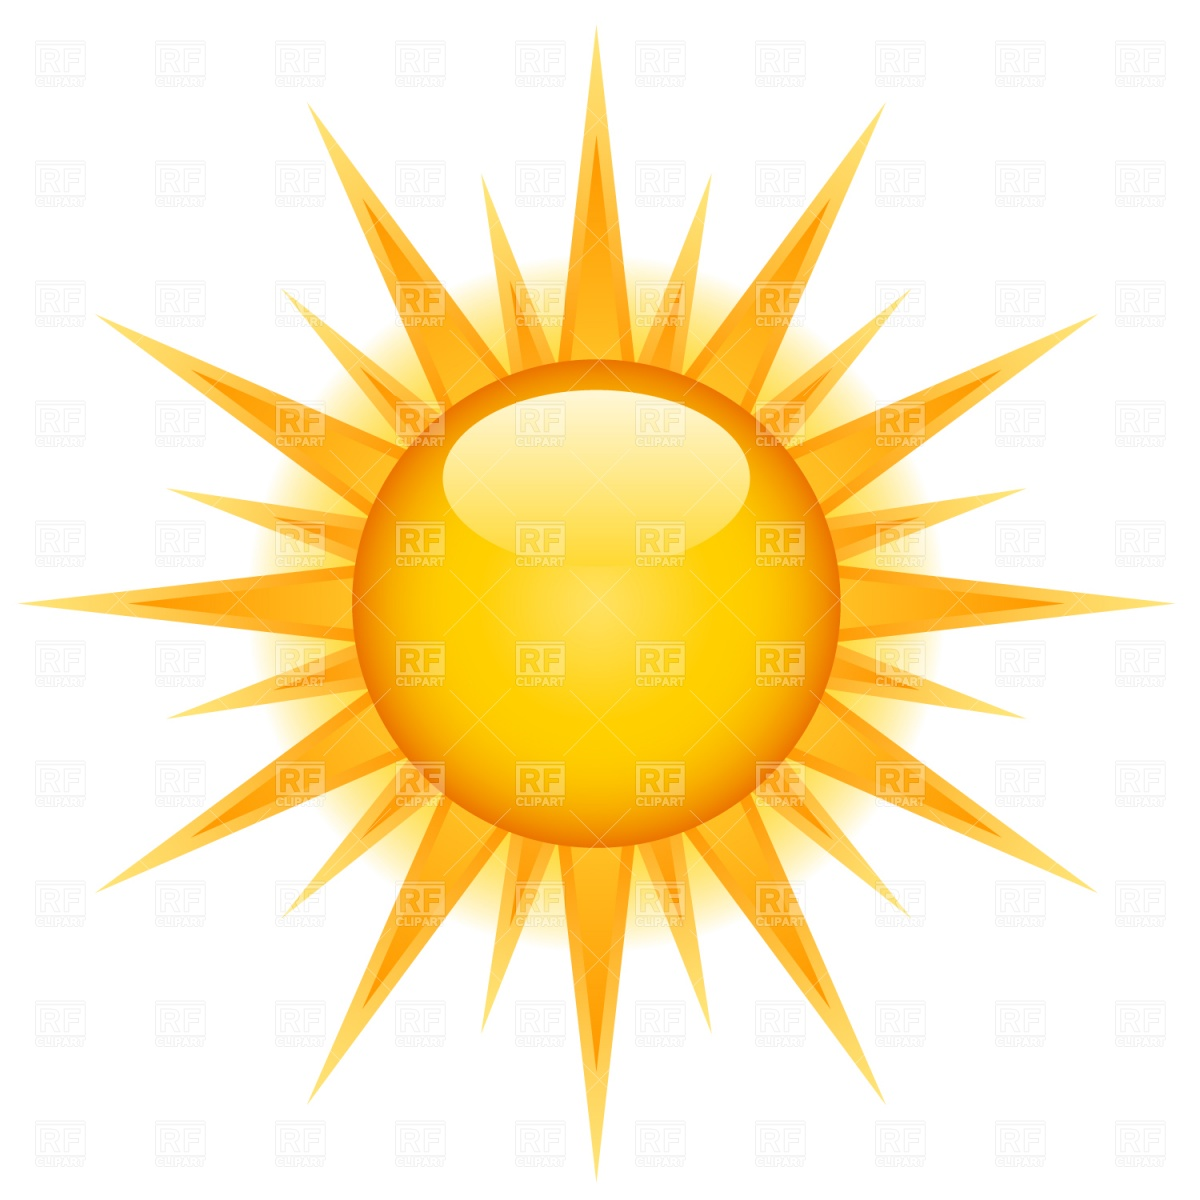 Free vector sun clipart 2